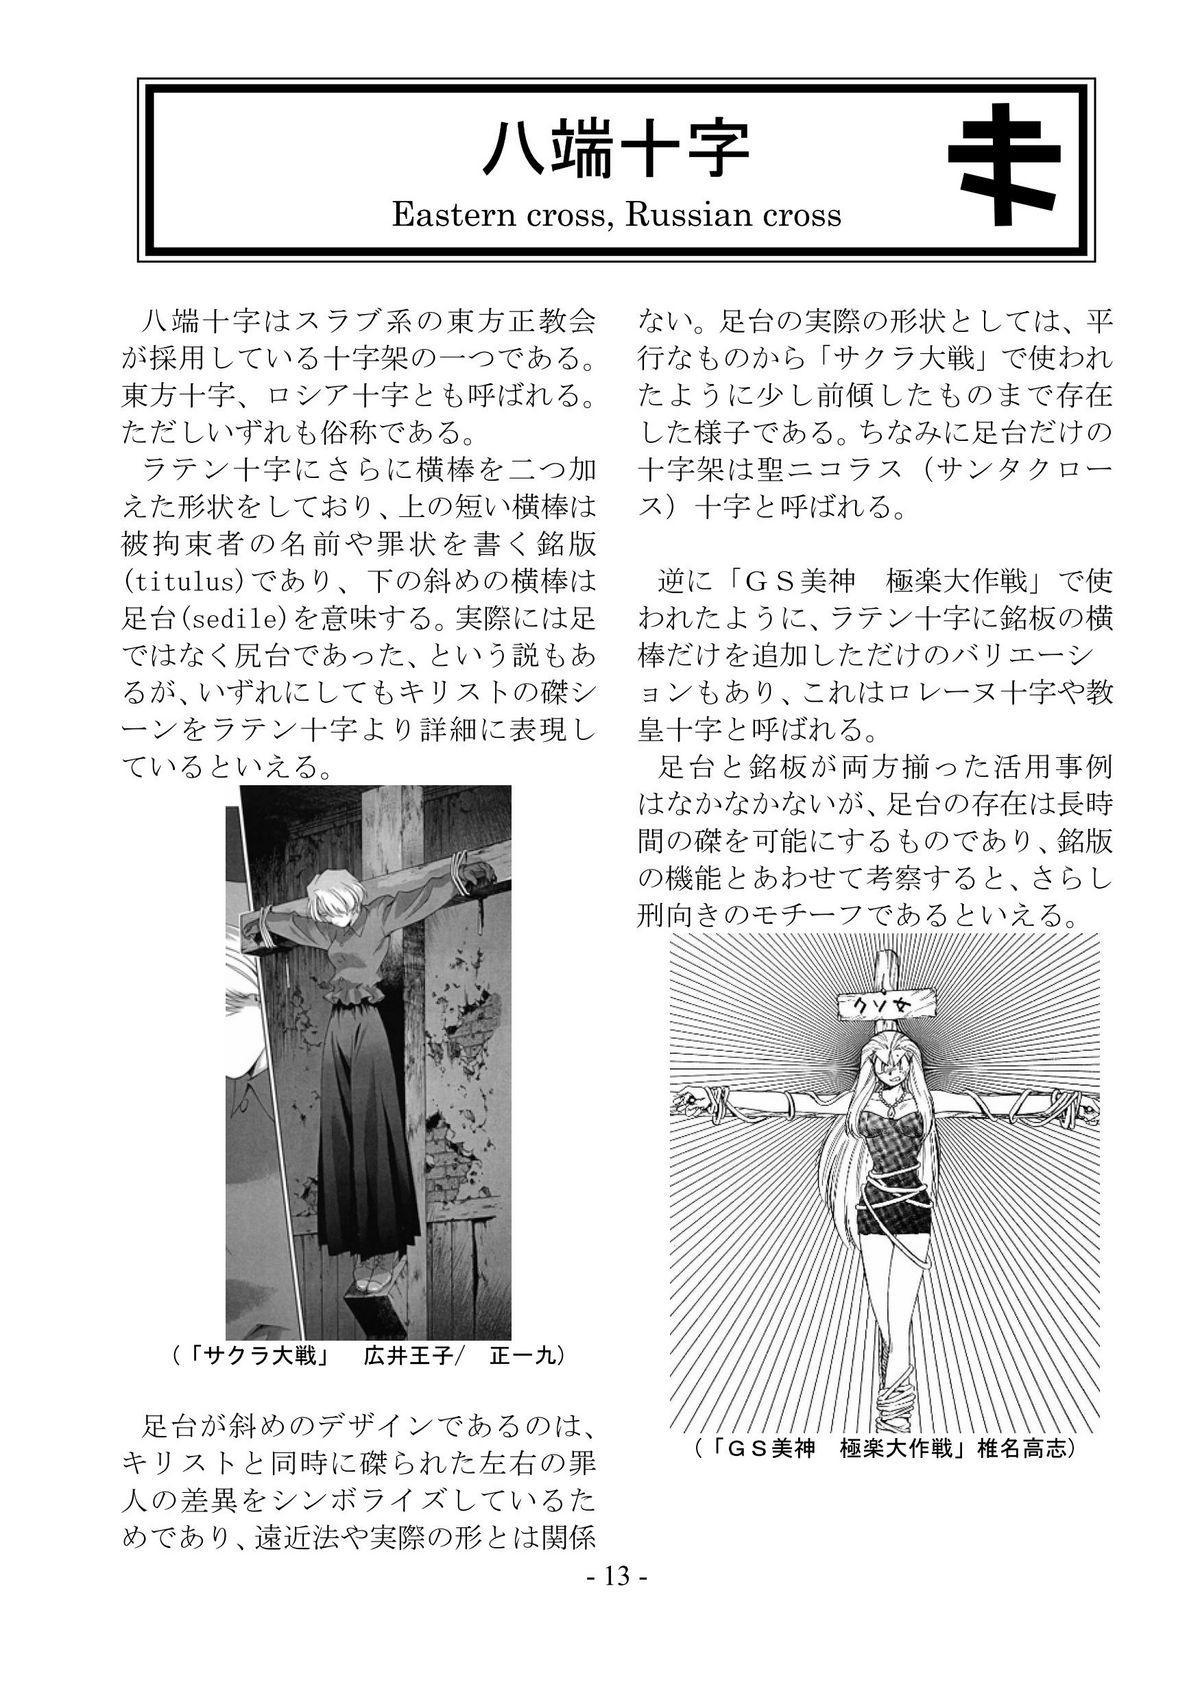 encyclopedia of crucifixion 13